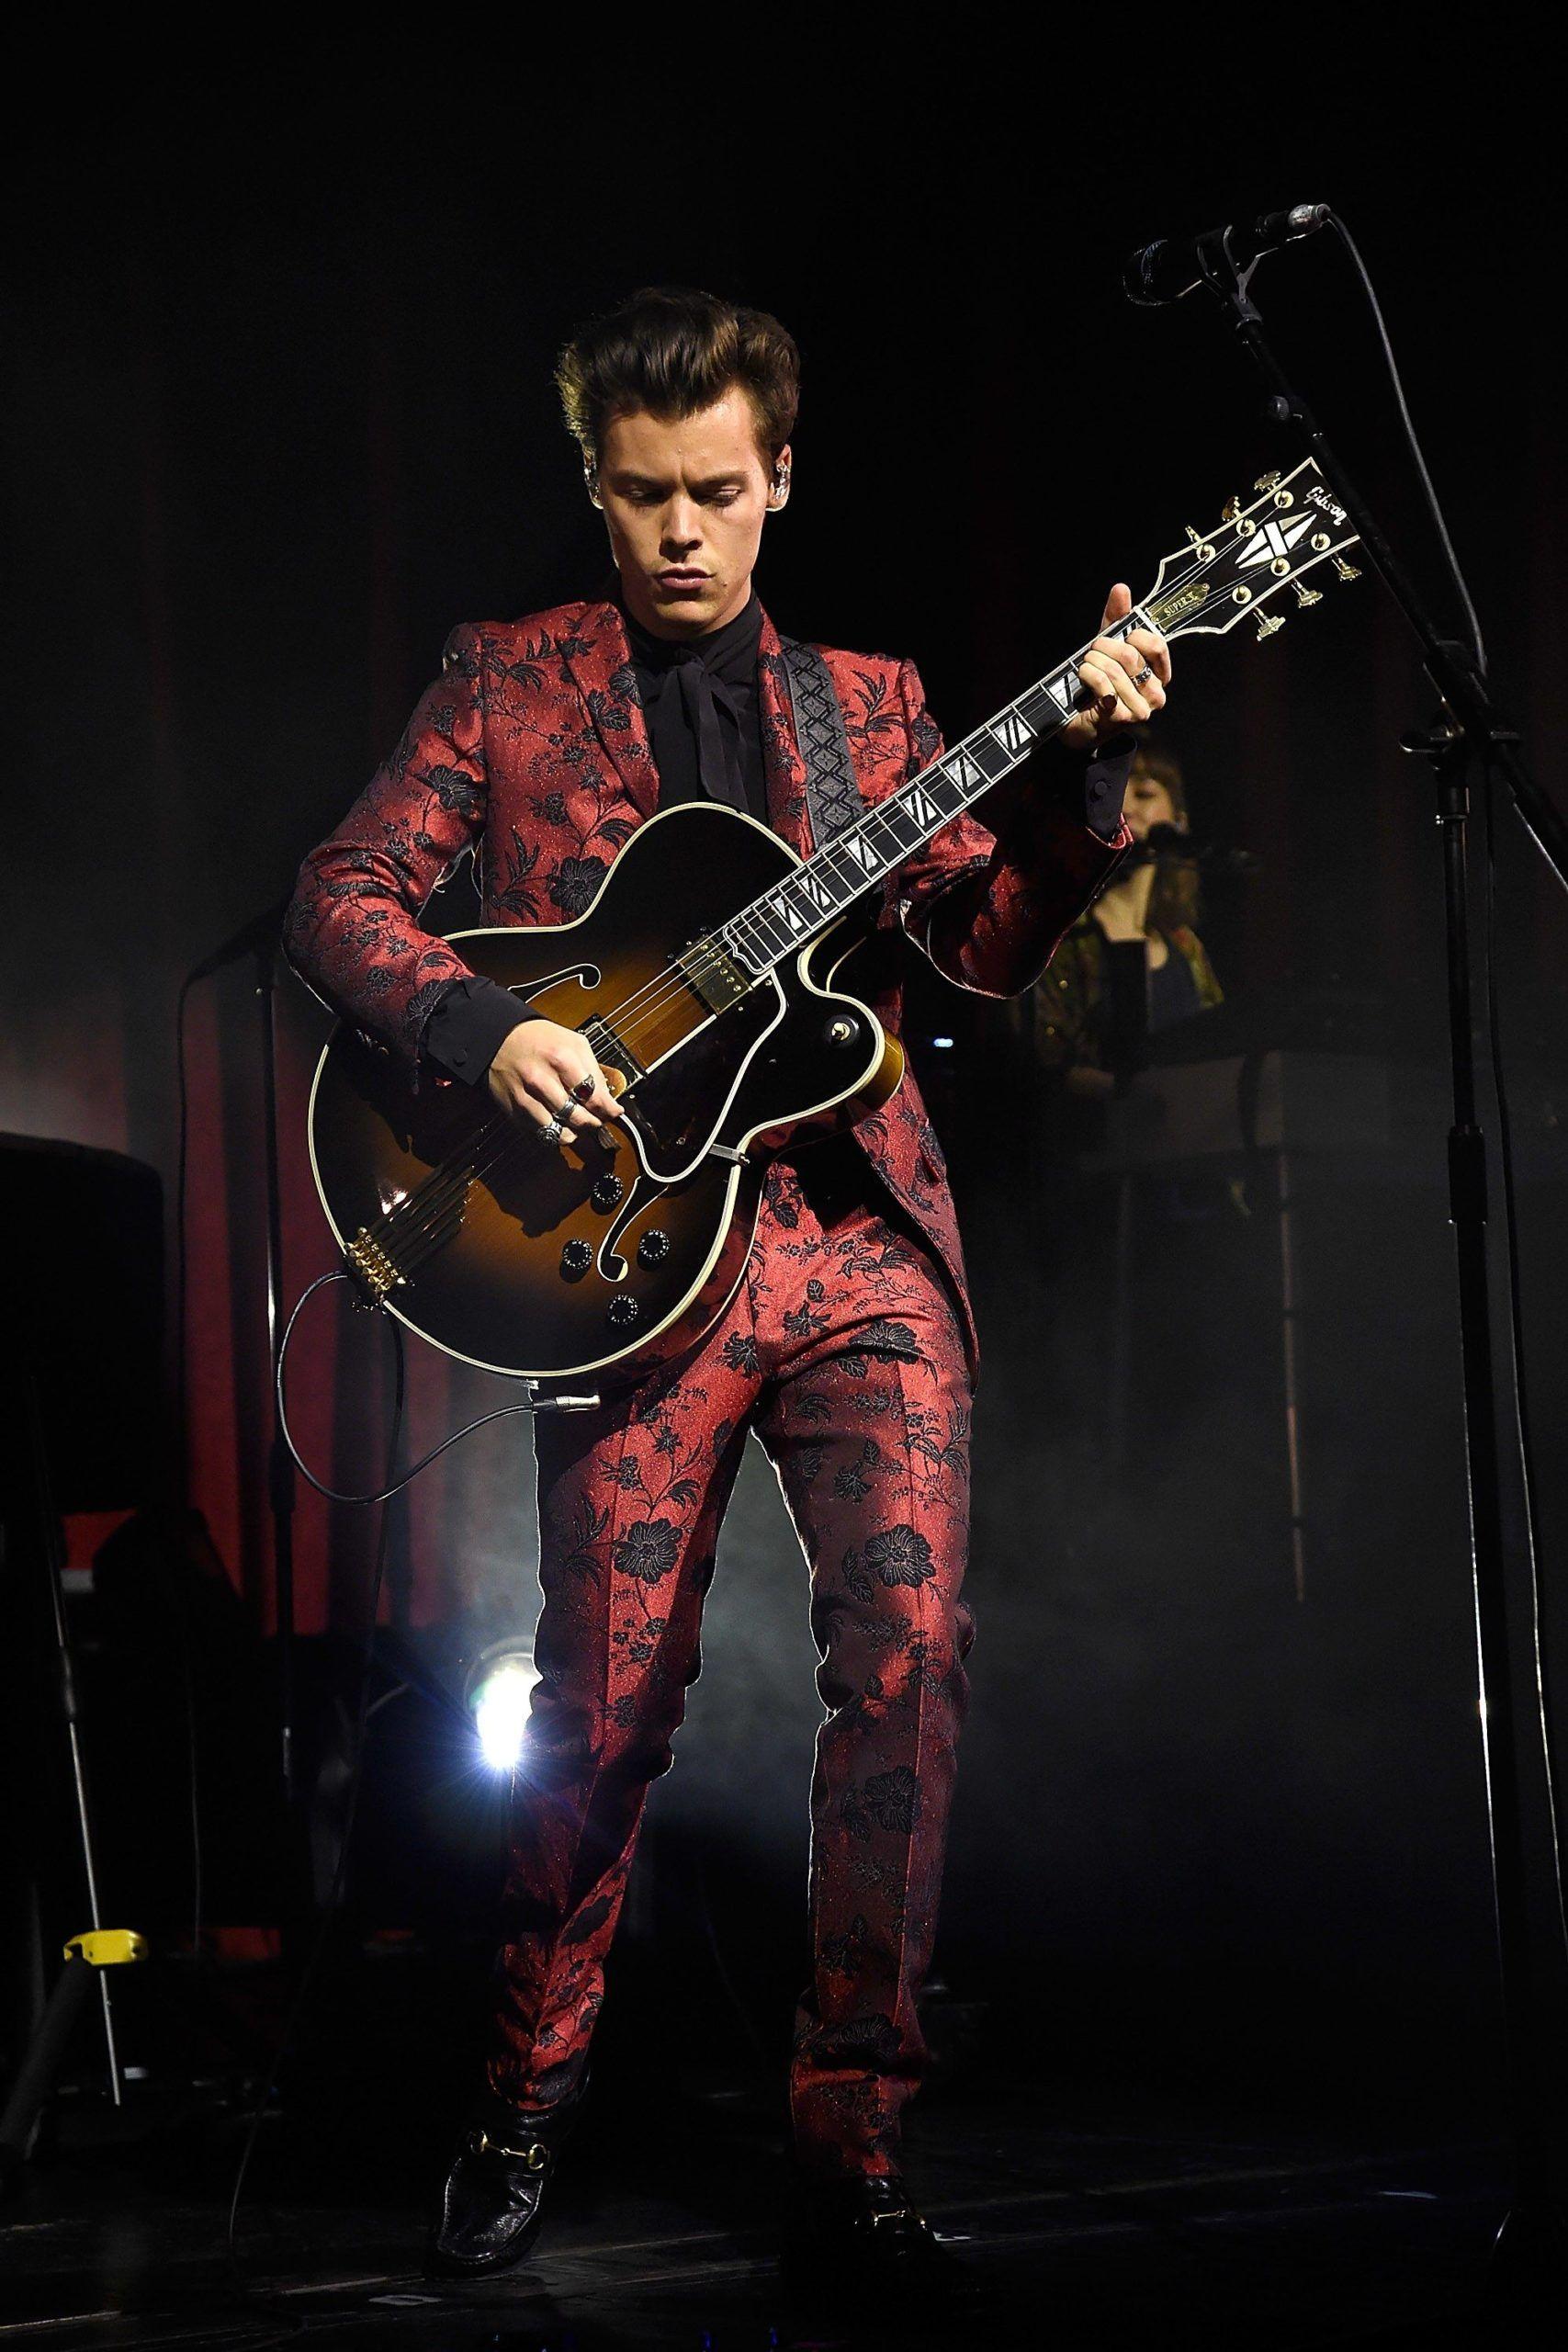 15 Amazing Suits That Harry Styles Wore on His World Tour - 15 Amazing Suits That Harry Styles Wore on His World Tour    Every Harry Styles Suit From His Solo T - #AlexaChung #Amazing #AngelaSimmons #CannesFilmFestival #CelebrityStyle #DianeKruger #EmmaRoberts #Harry #KendallJennerOutfits #KimKardashian #MiraDuma #MiroslavaDuma #RachelBilson #RedCarpetDresses #RedCarpetFashion #RedCarpetLooks #SarahJessicaParker #ShilpaShetty #SonakshiSinha #styles #StylingTips #suits #TokyoFashion #Tour #Victo